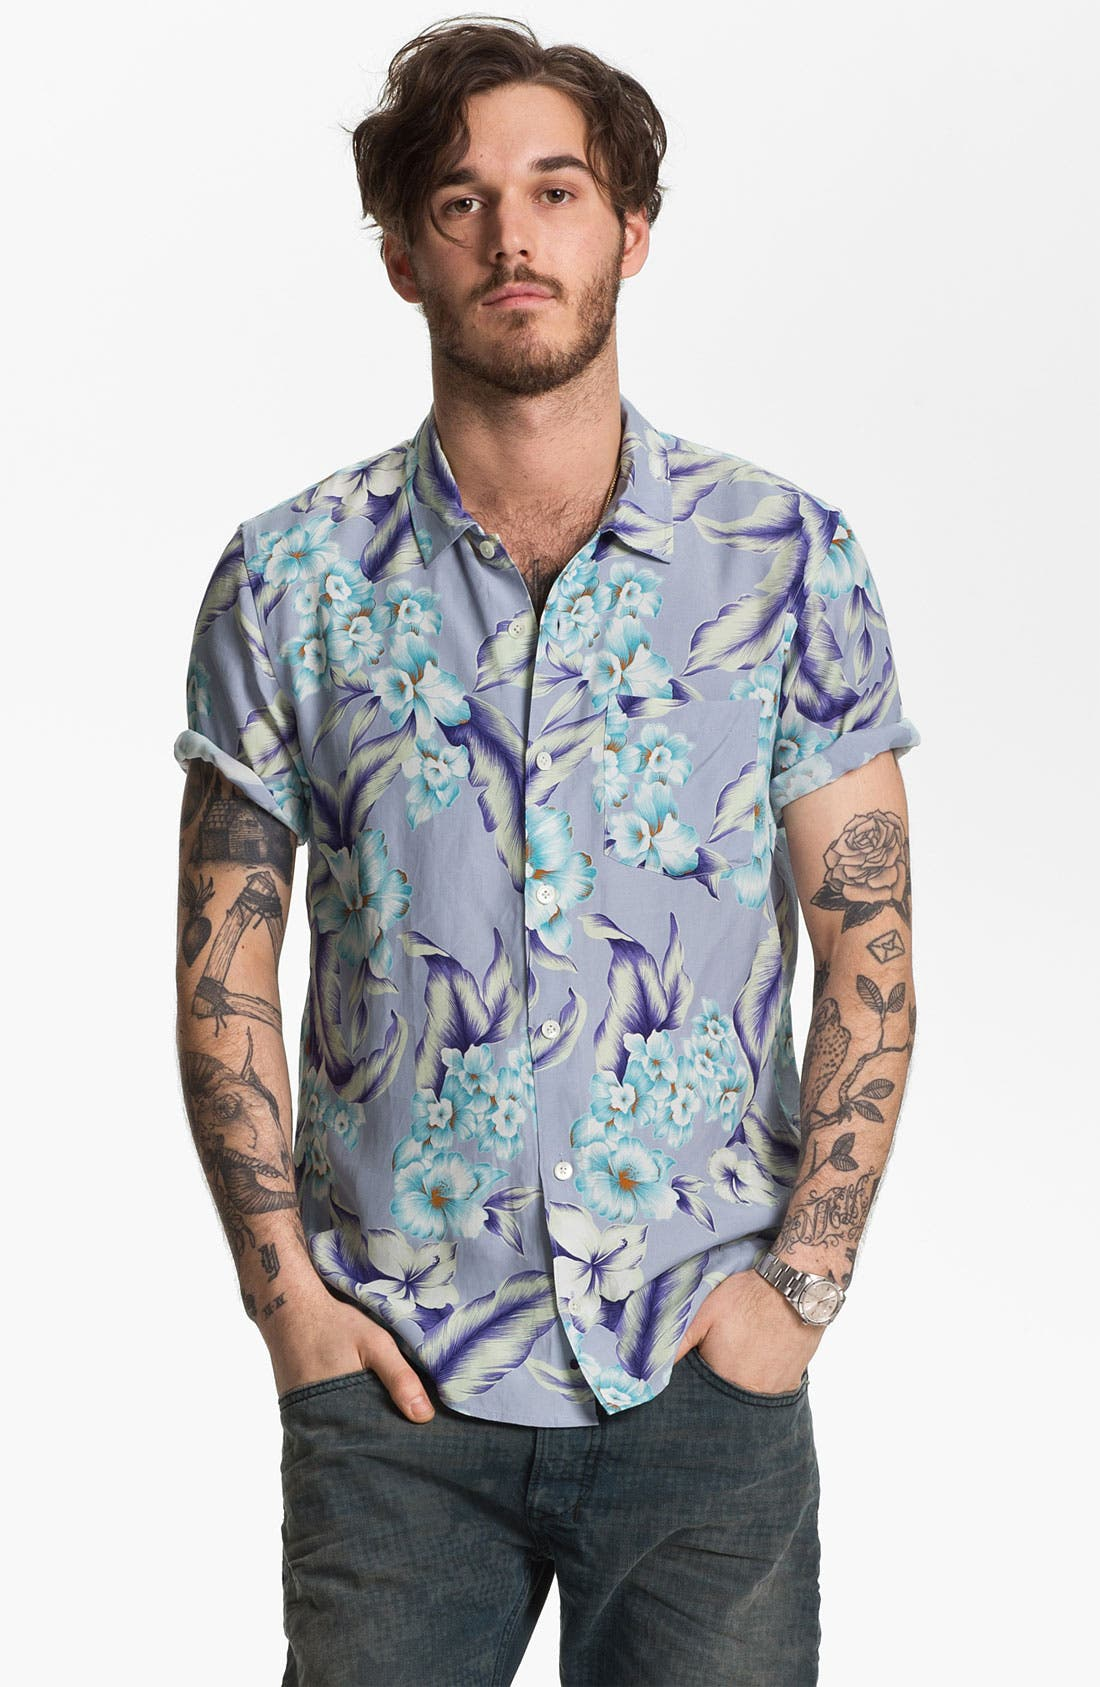 Alternate Image 1 Selected - Stussy Deluxe Aloha Print Cotton Shirt